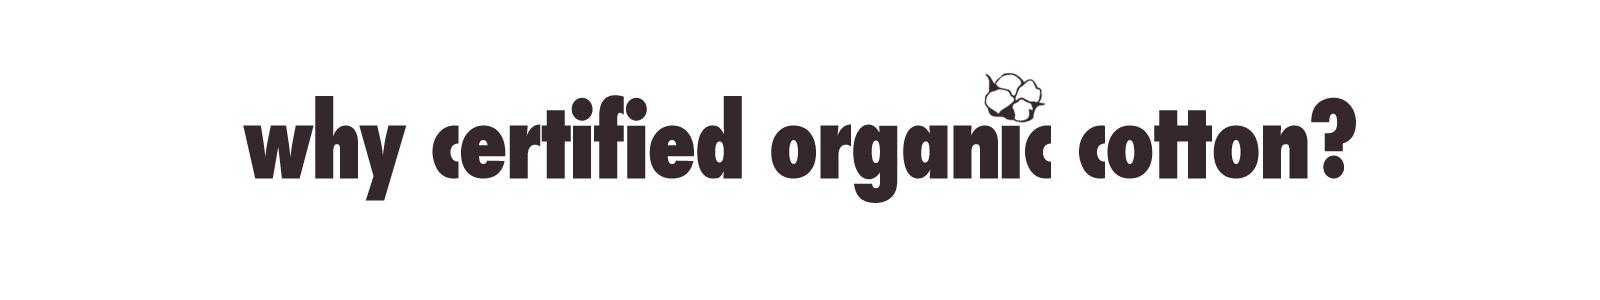 kalila_organics_why_certified_organic_cotton_heading